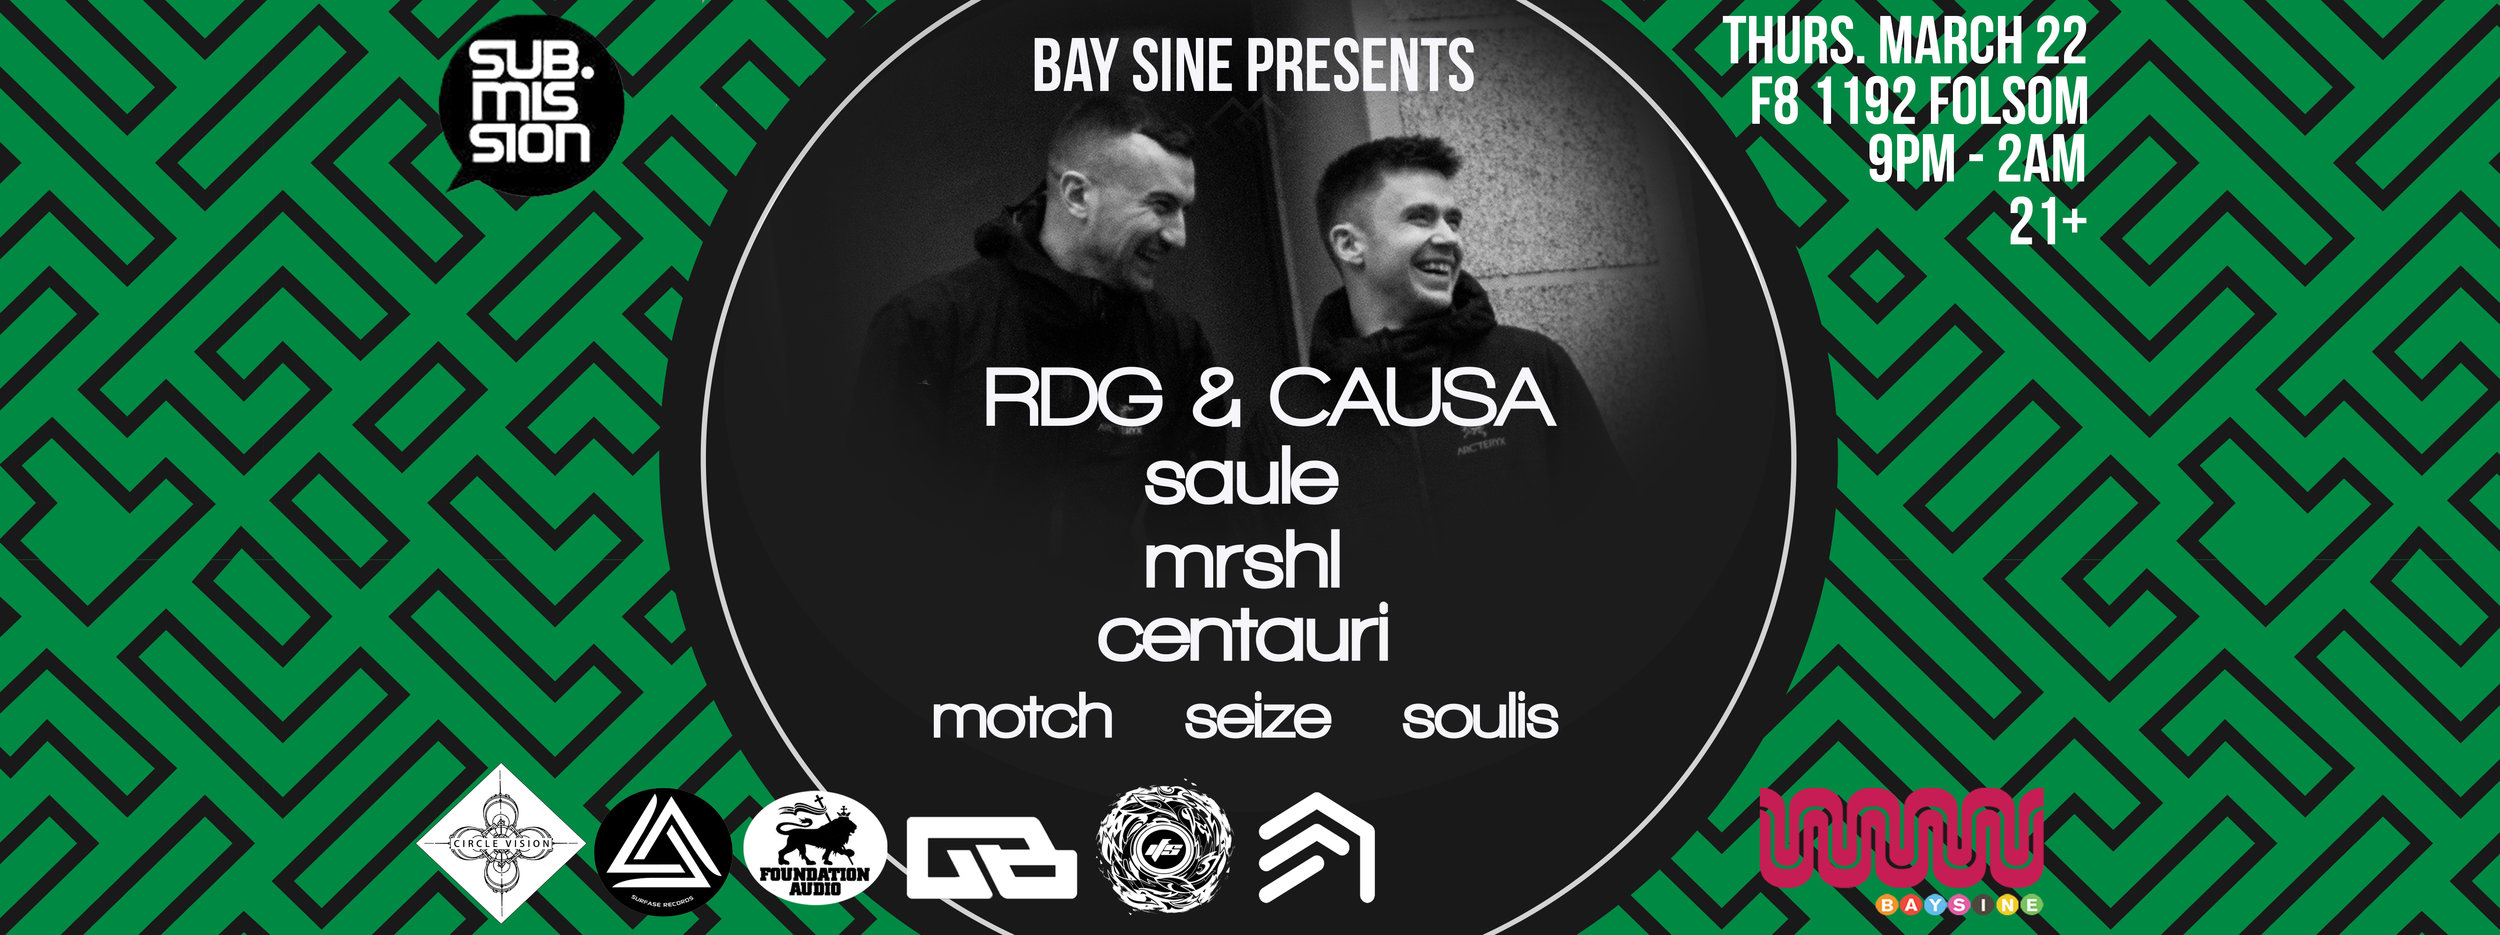 RDG & Causa cover photo.jpg